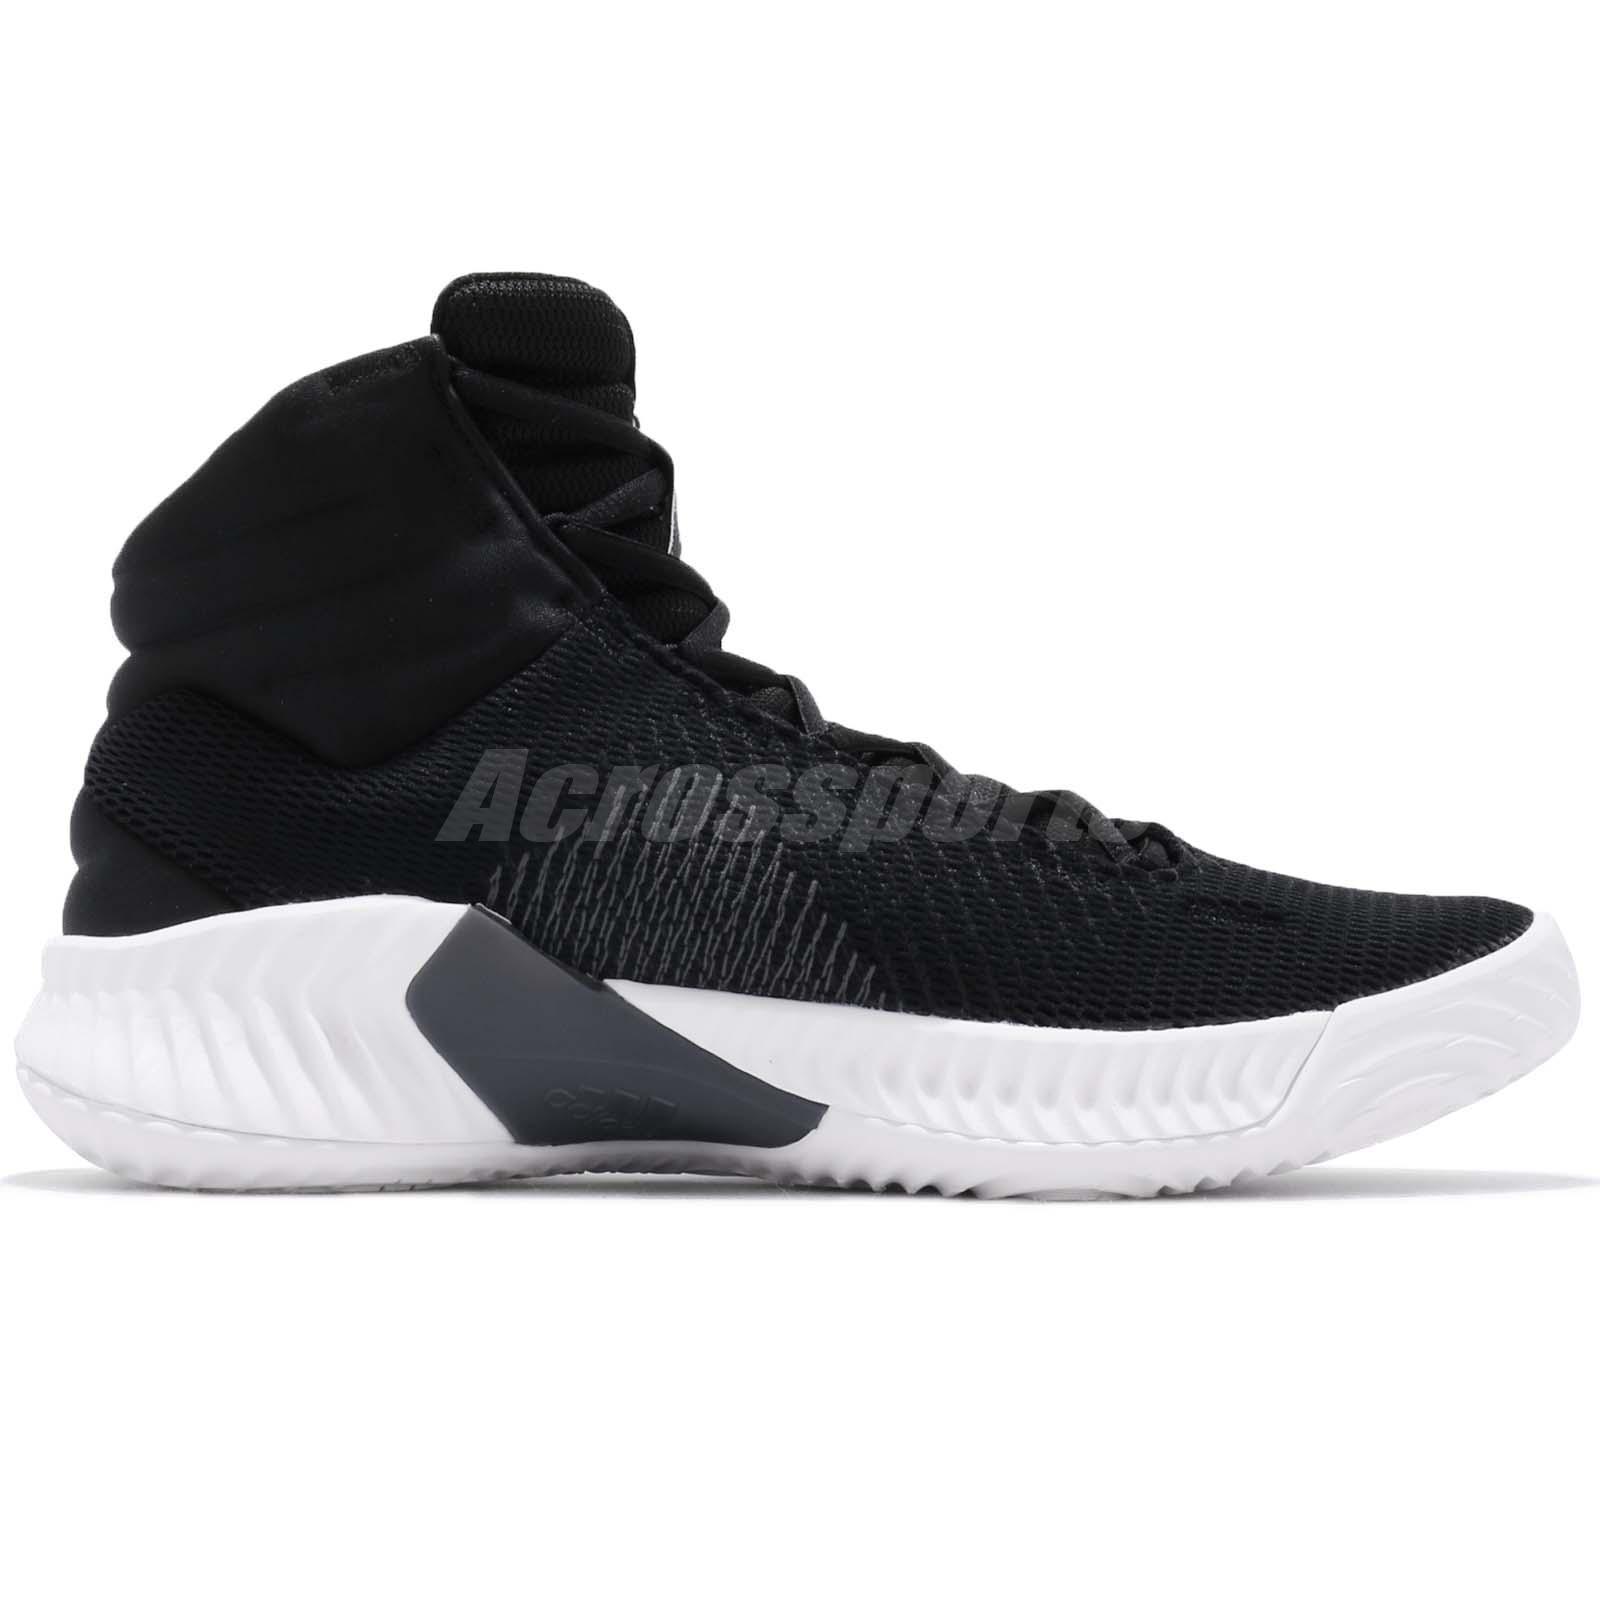 9a196fdd7e2f7 adidas Pro Bounce 2018 Black Grey White Men Basketball Shoes ...